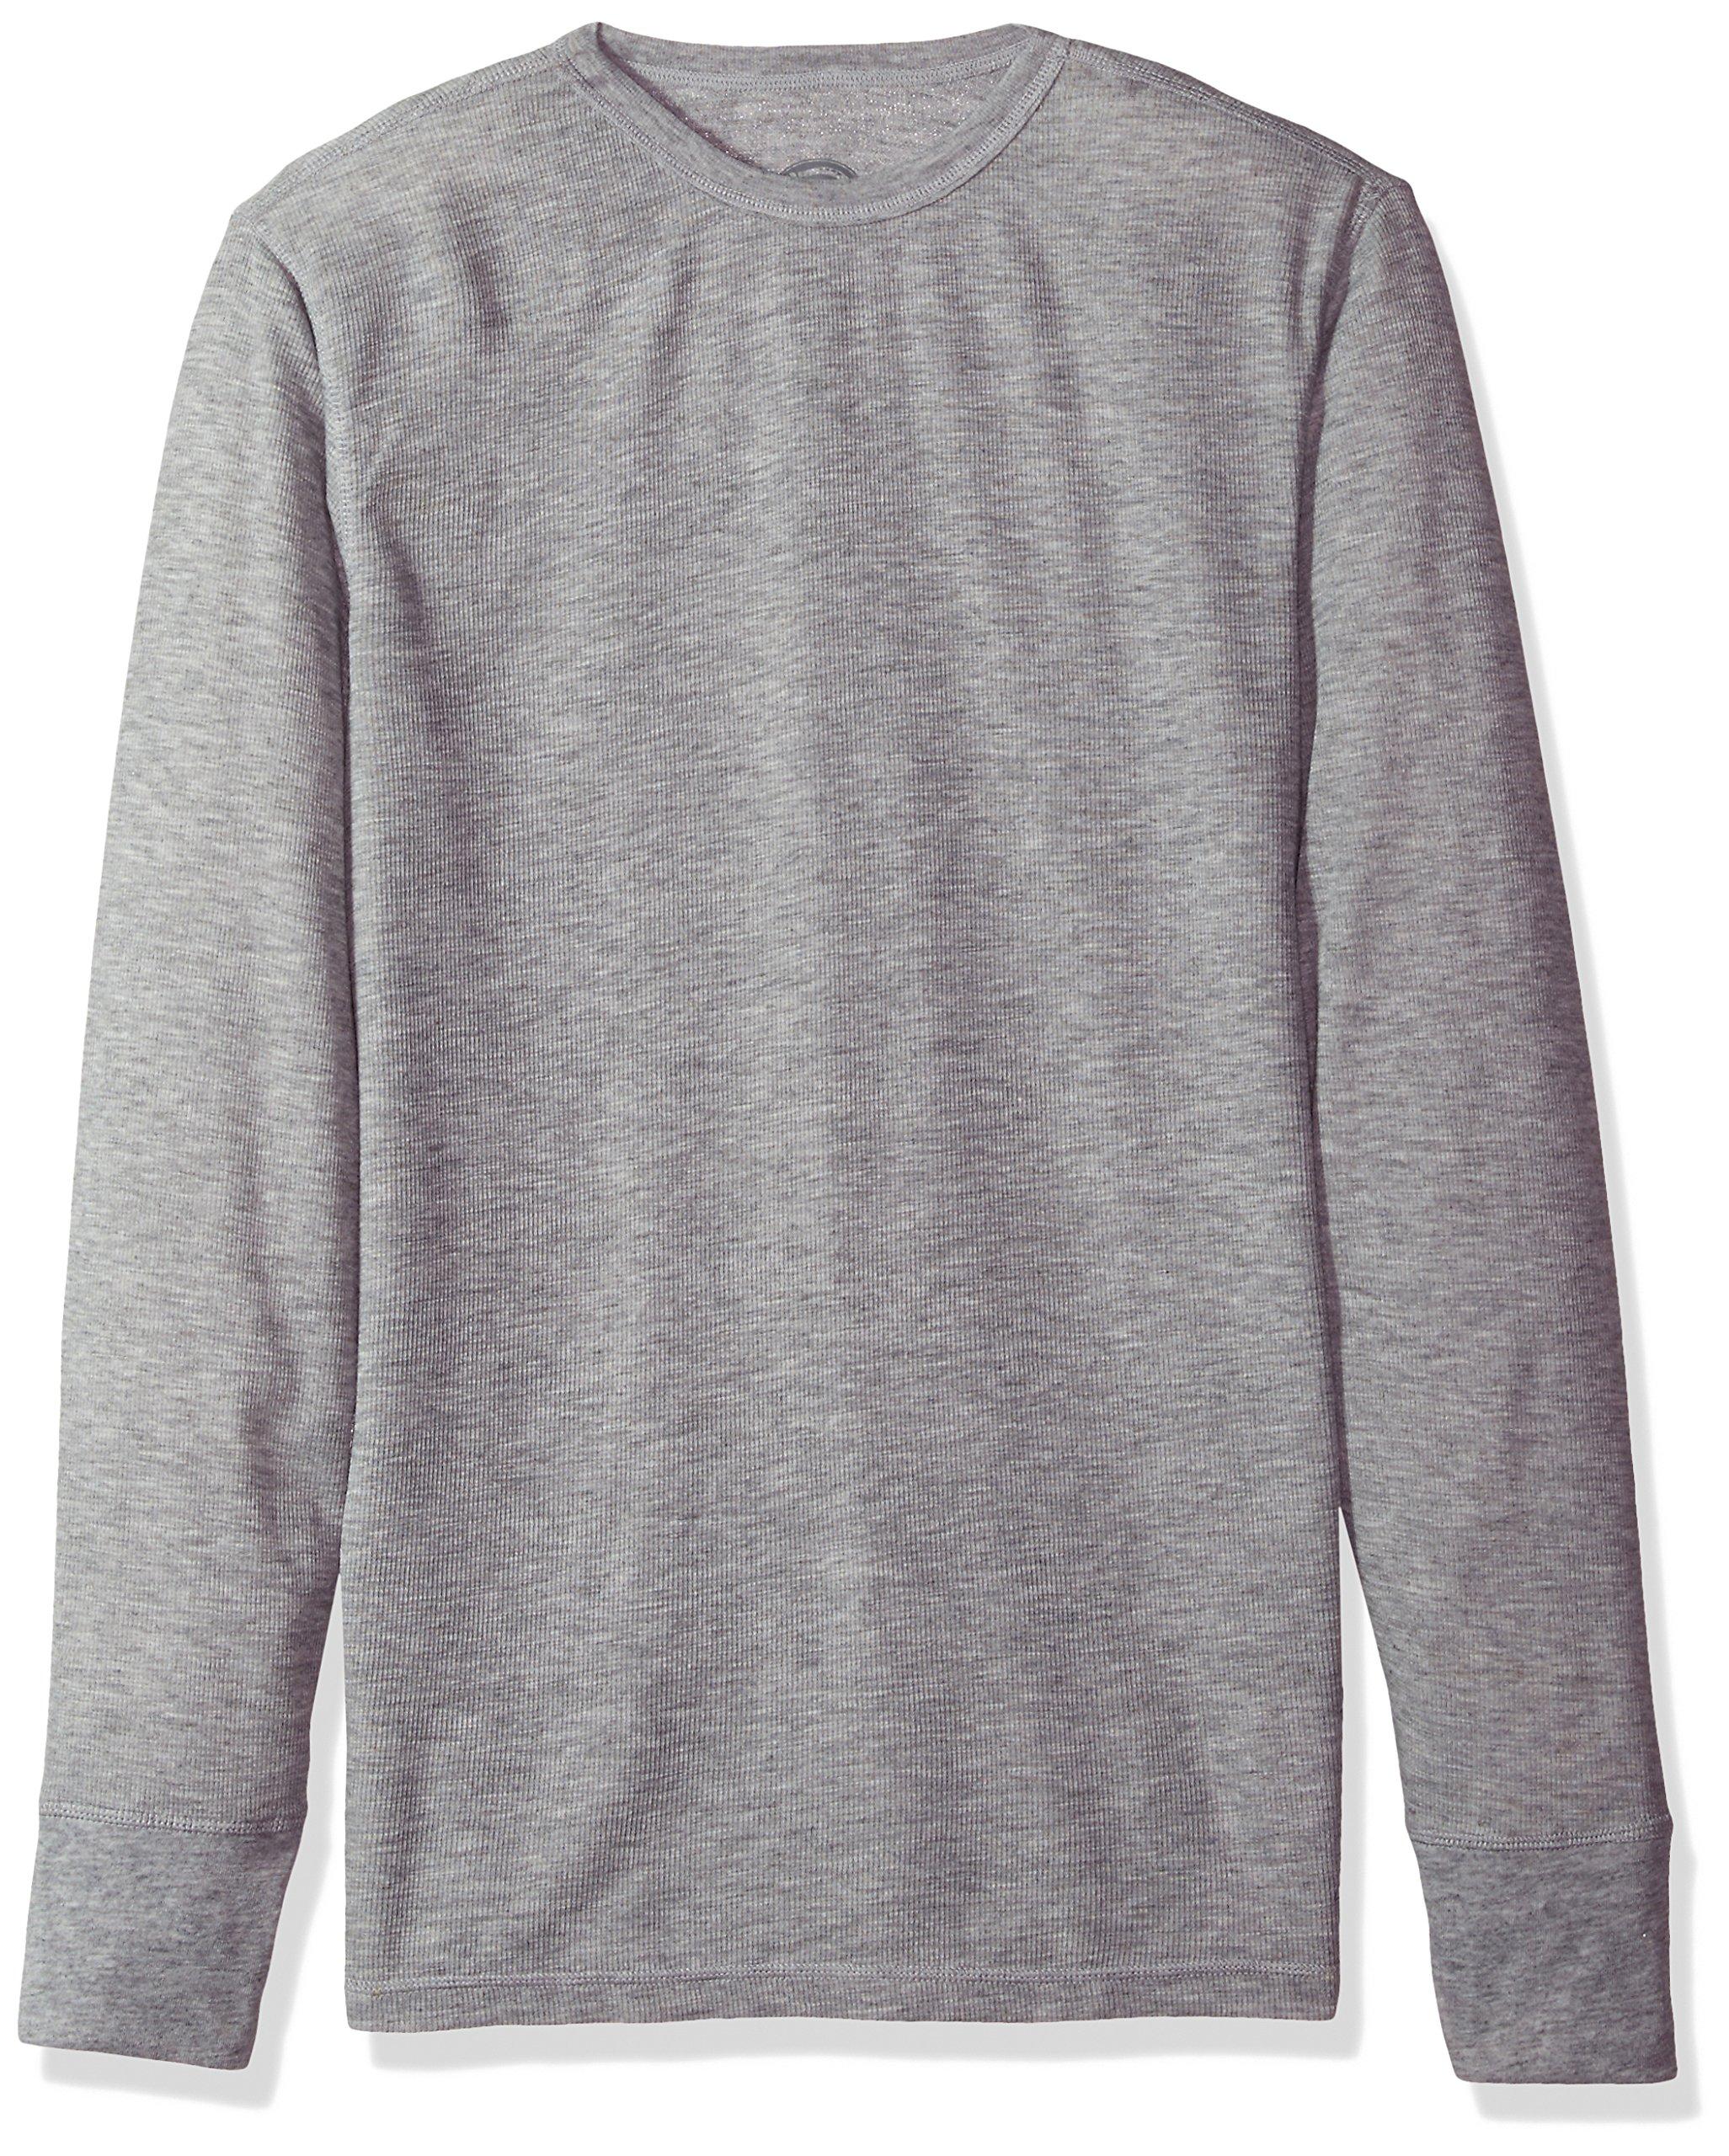 Dickies Men's Technical Wool Thermal Top